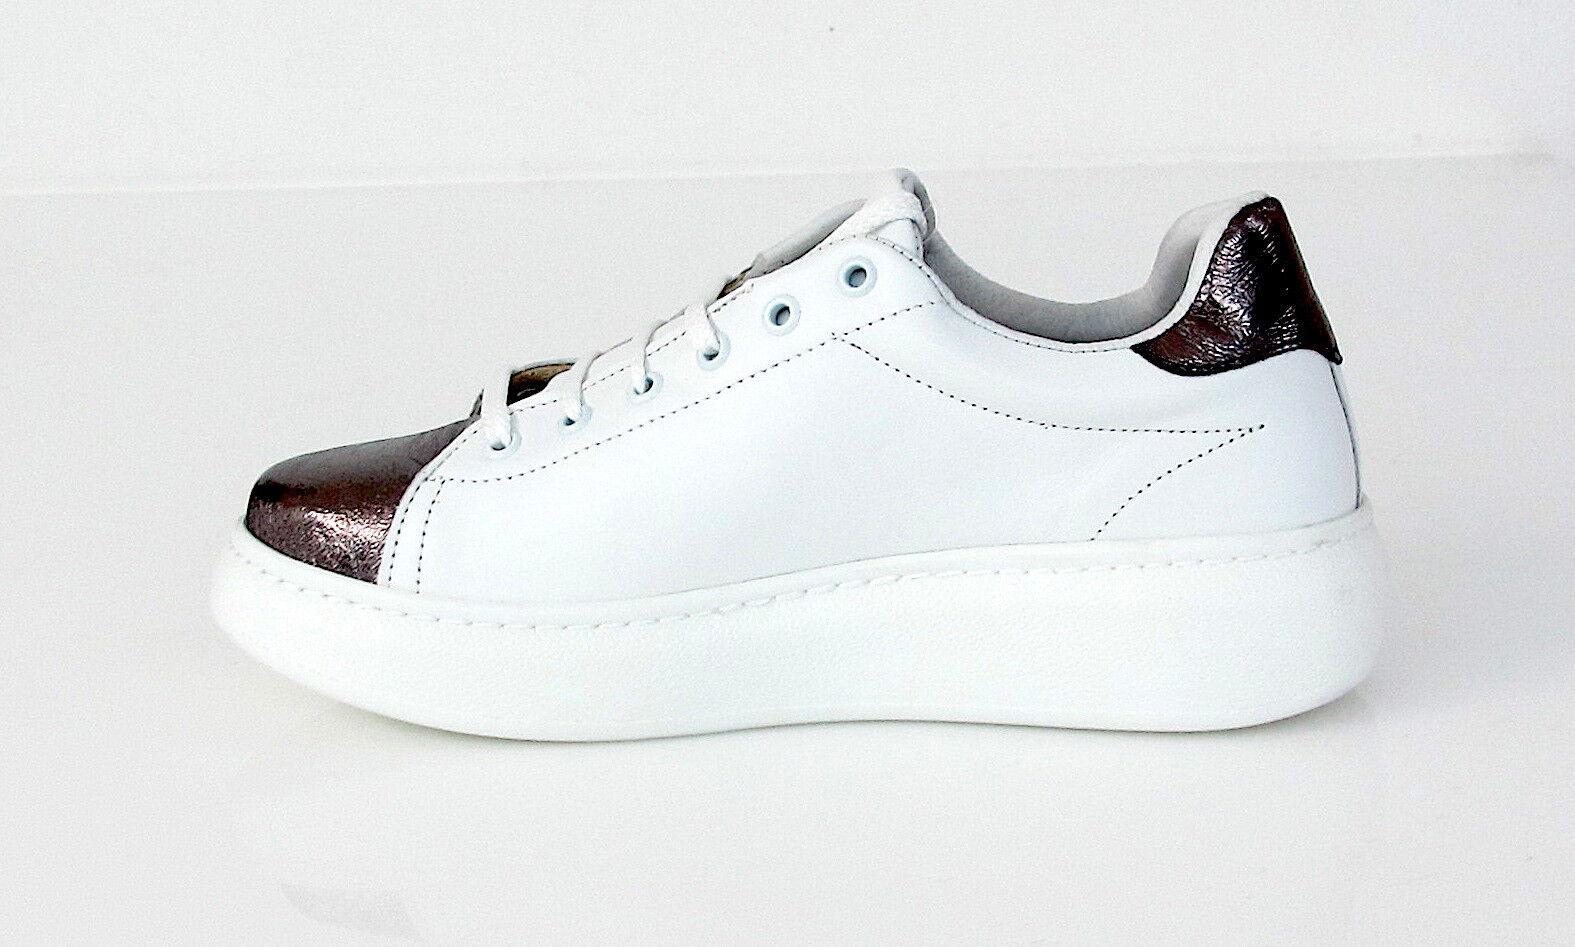 NU2 col.bianco/grau Schuhe/Sportschuhe Frau Alice-c 207 col.bianco/grau NU2 met. Sommer 2017 2b39f6